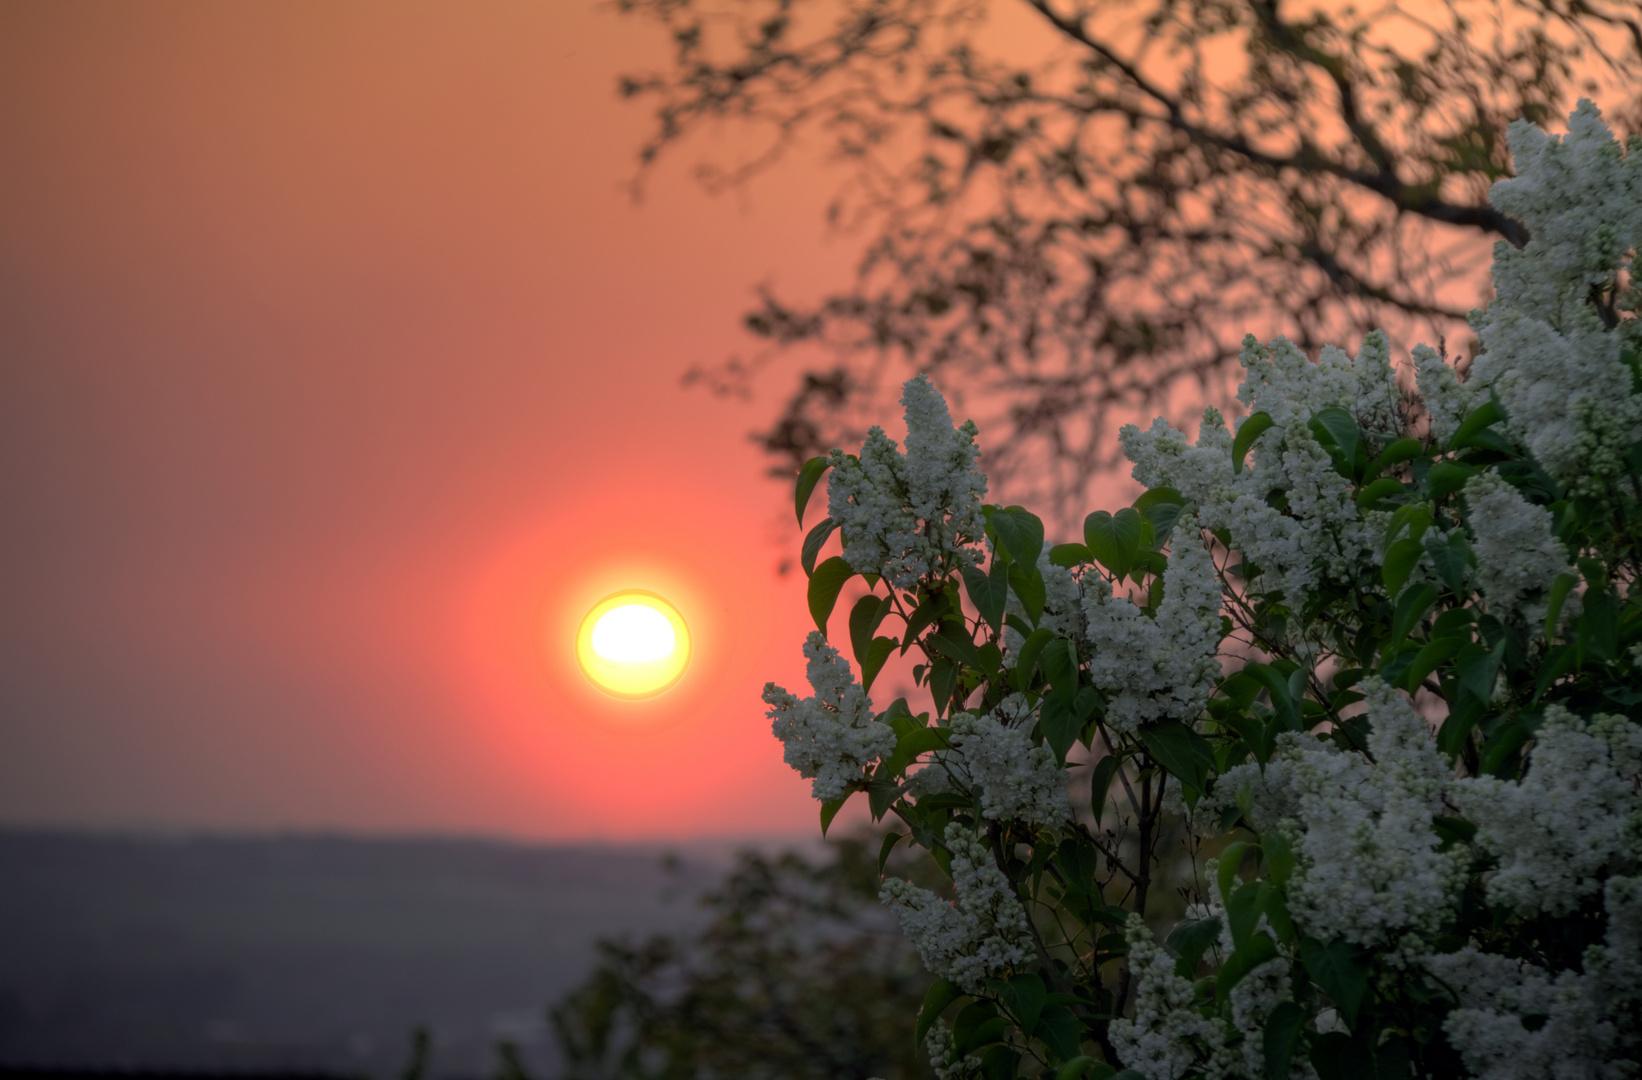 Sonnenuntergang-Sümmern-1